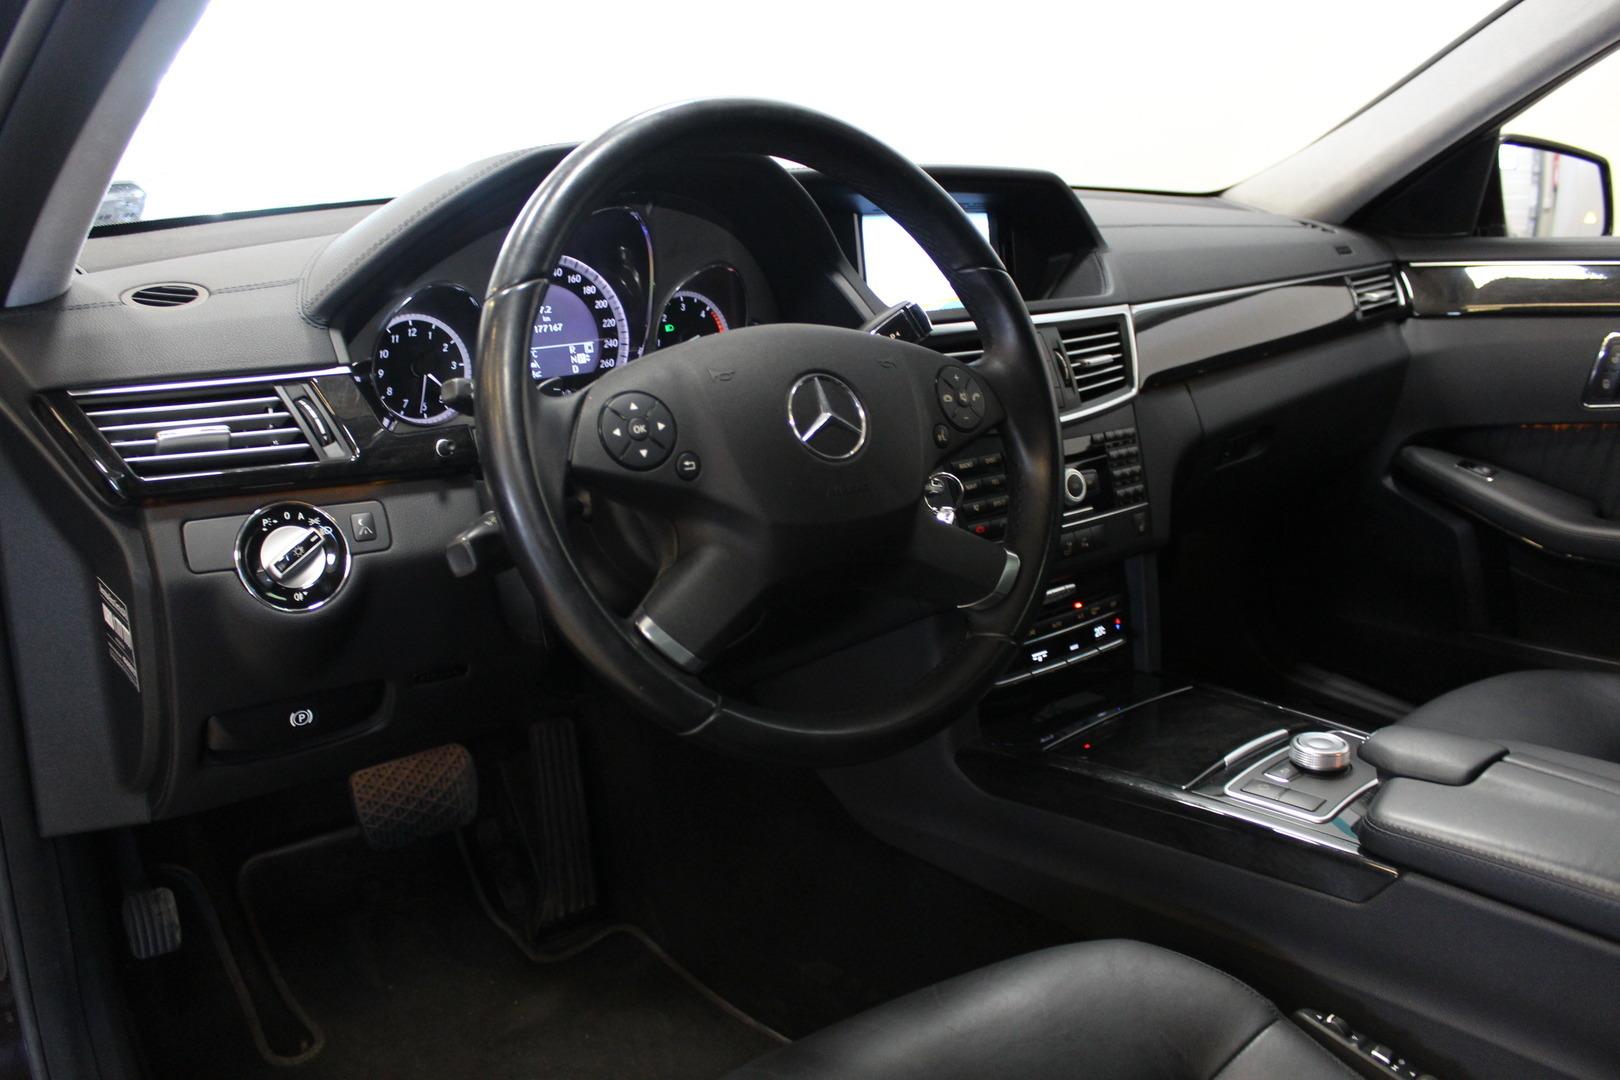 Mercedes-Benz E, 350 CDI BE A **Juuri tullut** #Siistikuntoinen #Nahat #Nightwision-kamera #Navi